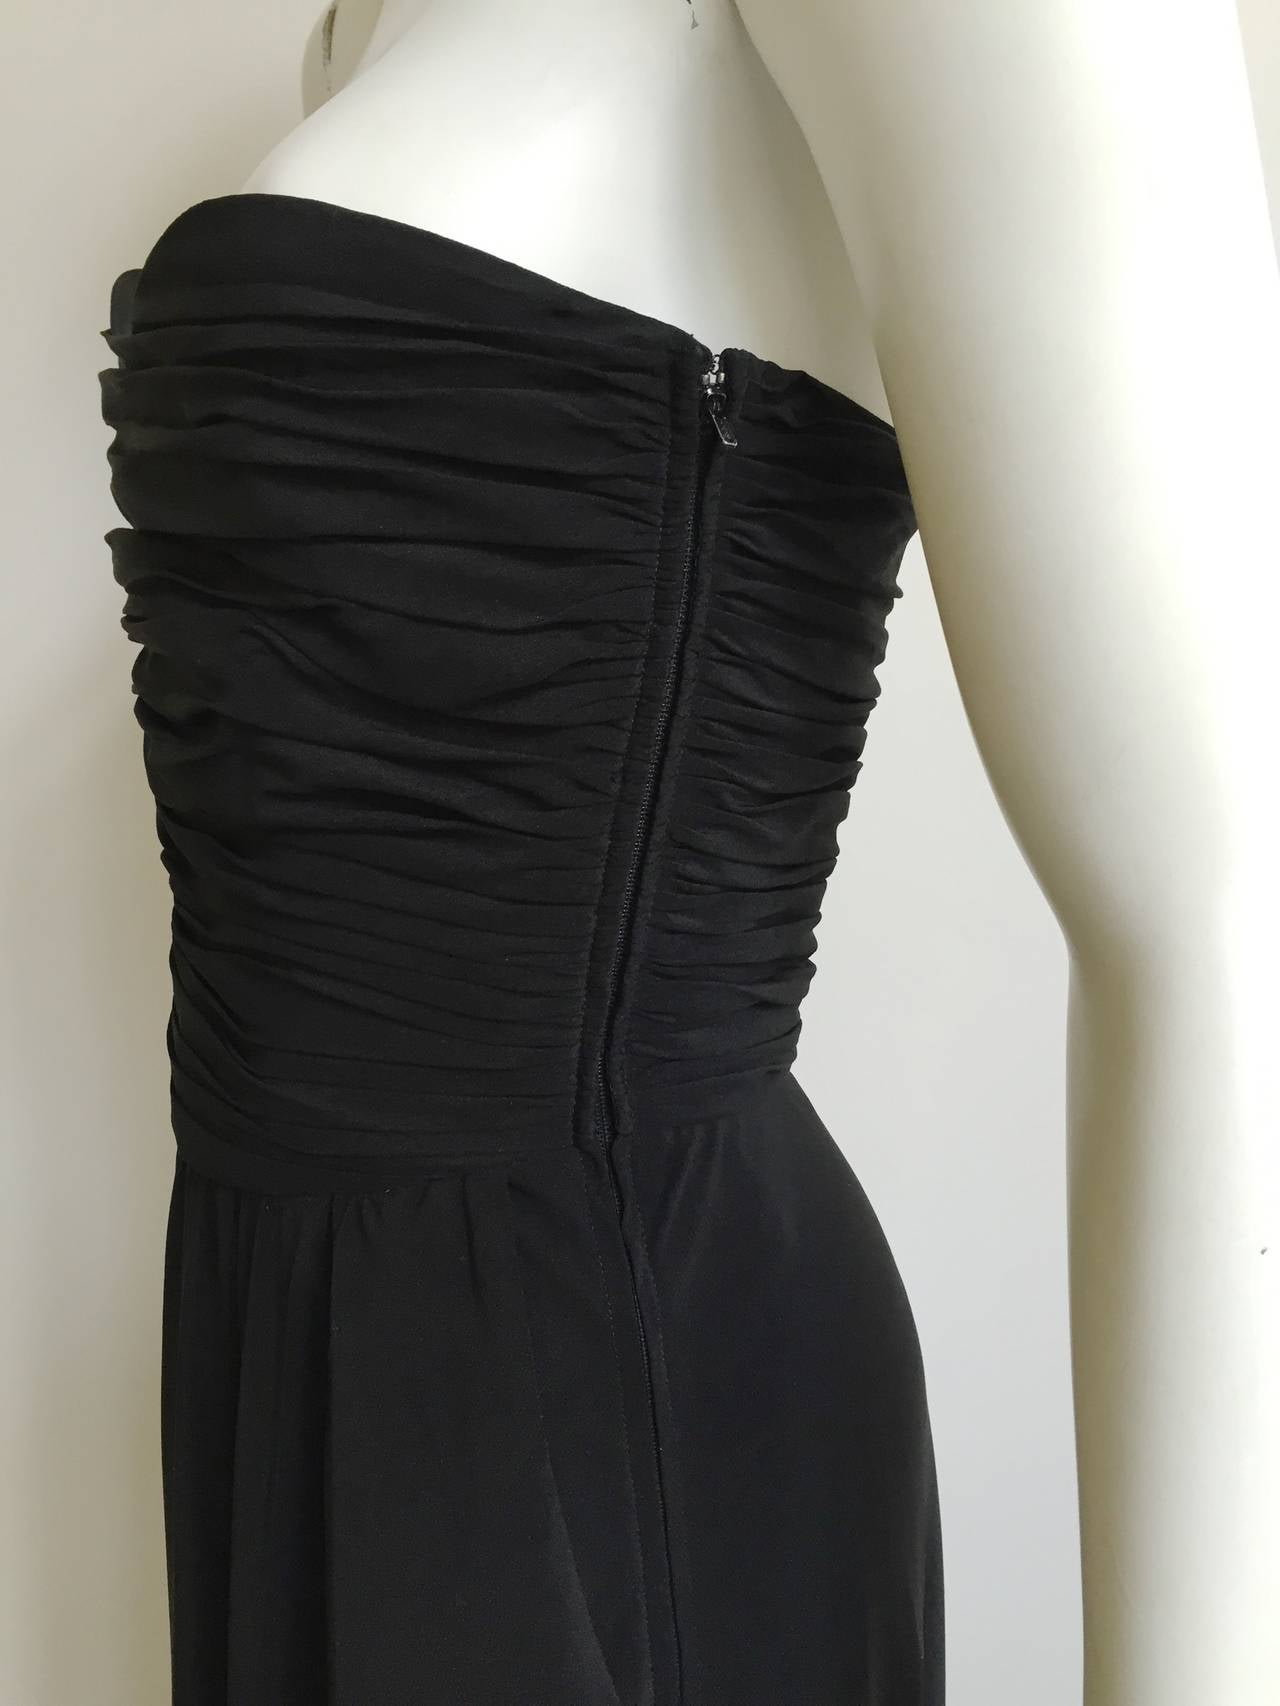 292ad7daf23f Black Strapless Cocktail Dress With Pockets   Saddha